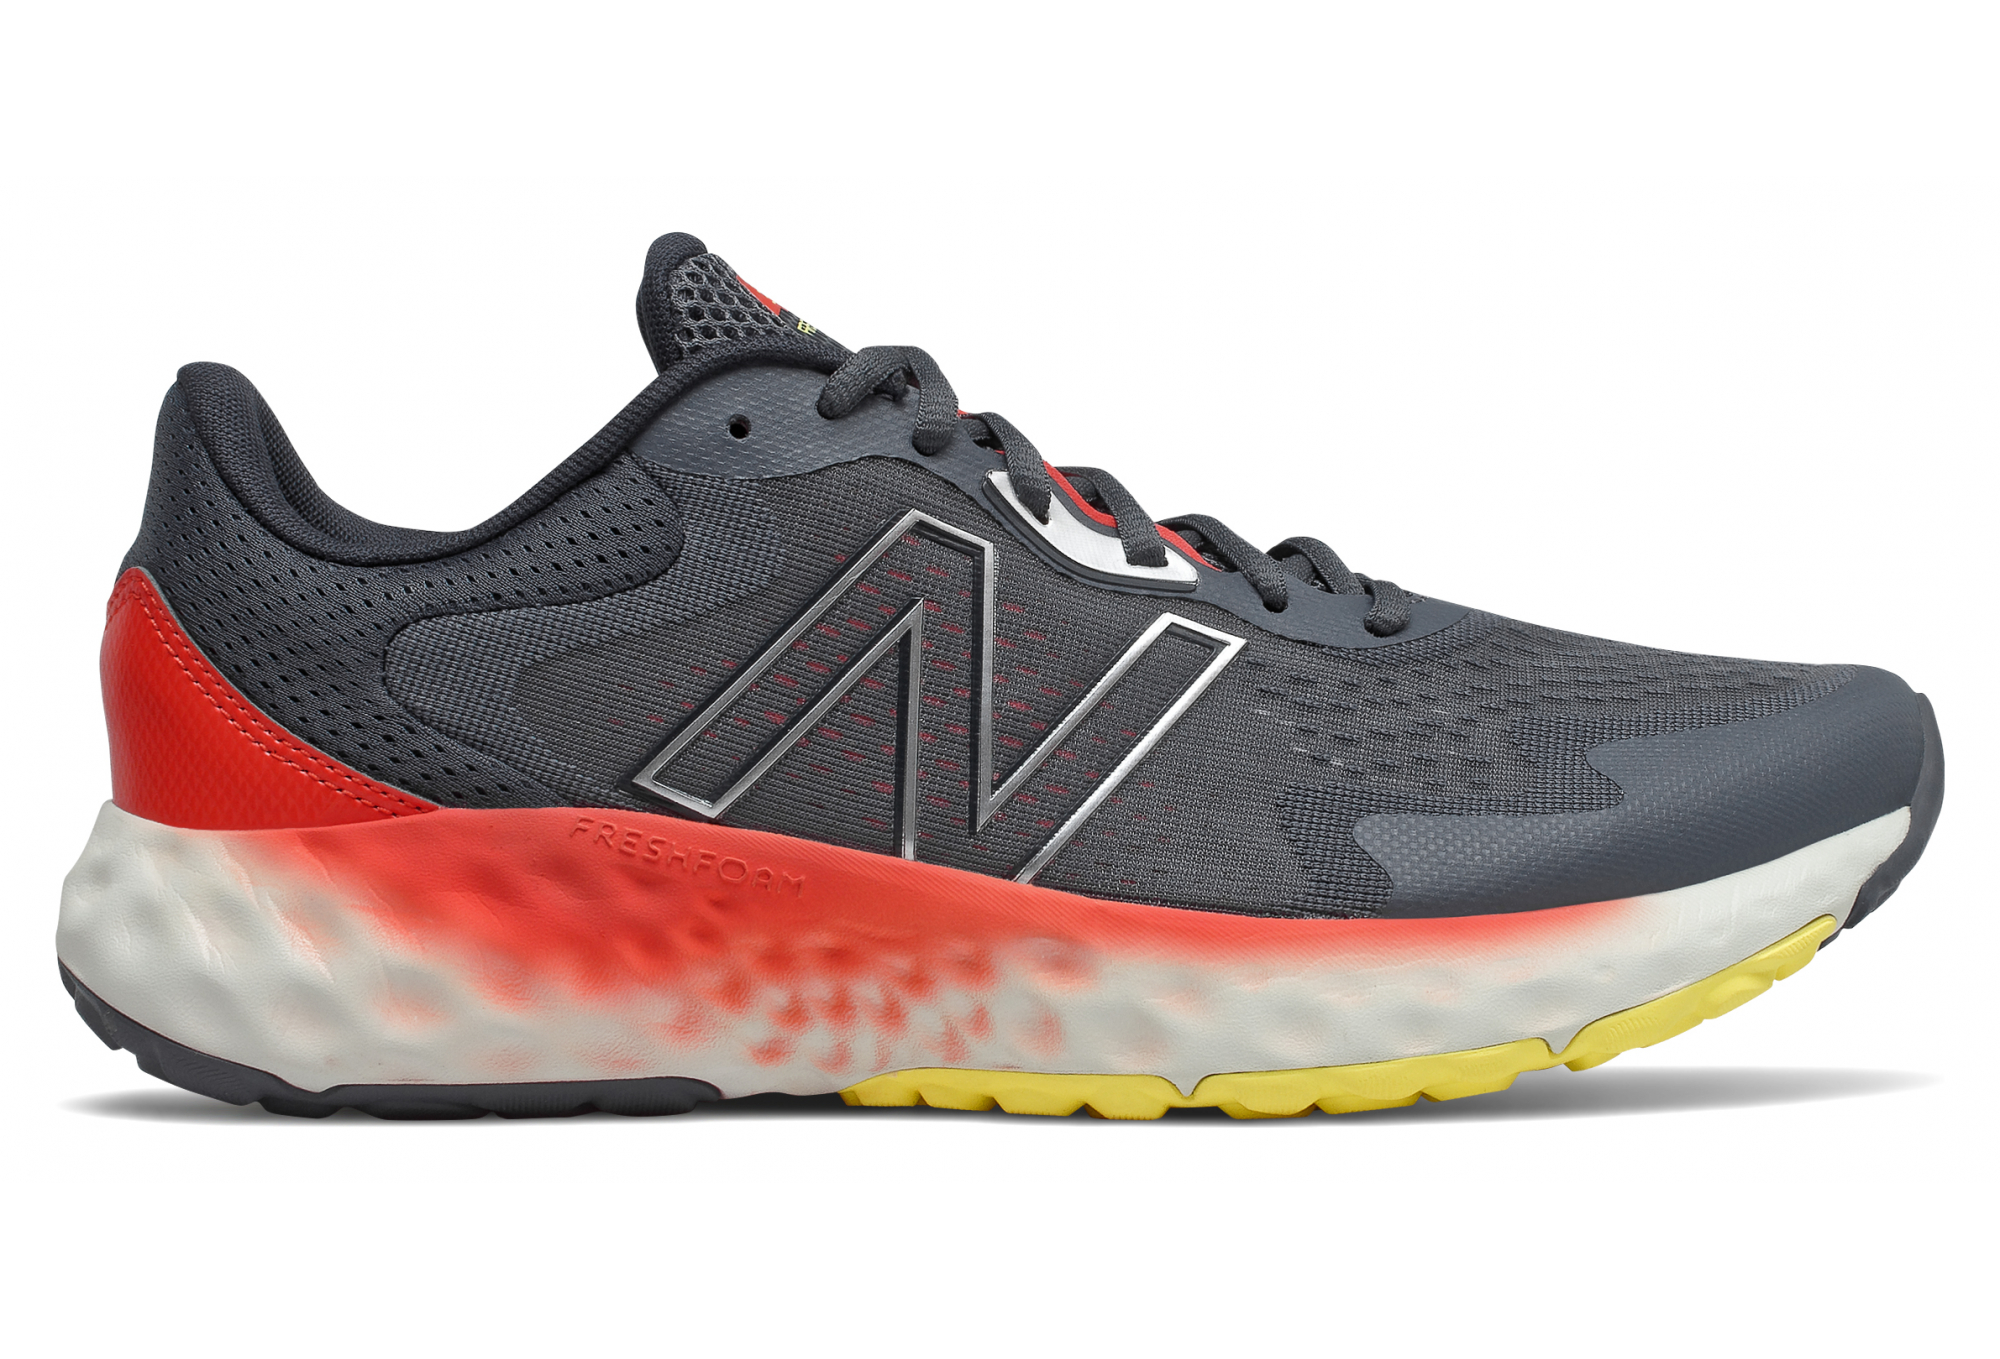 Scarpe da corsa da uomo New Balance Fresh Foam Evoz grigio arancione